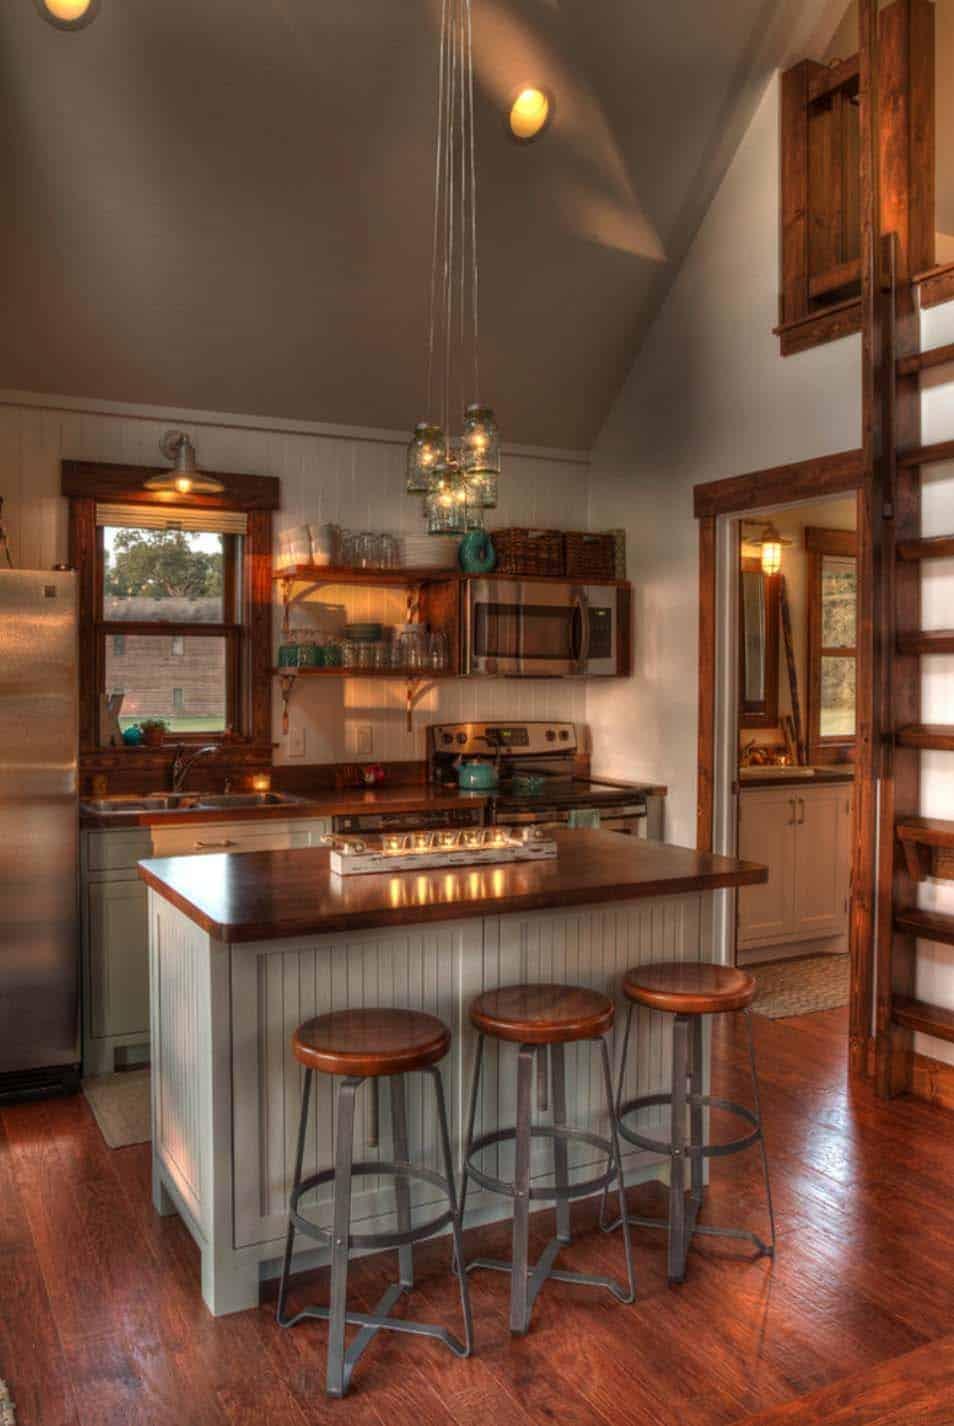 Idyllic Lake House In Minnesota Provides A Welcoming Respite